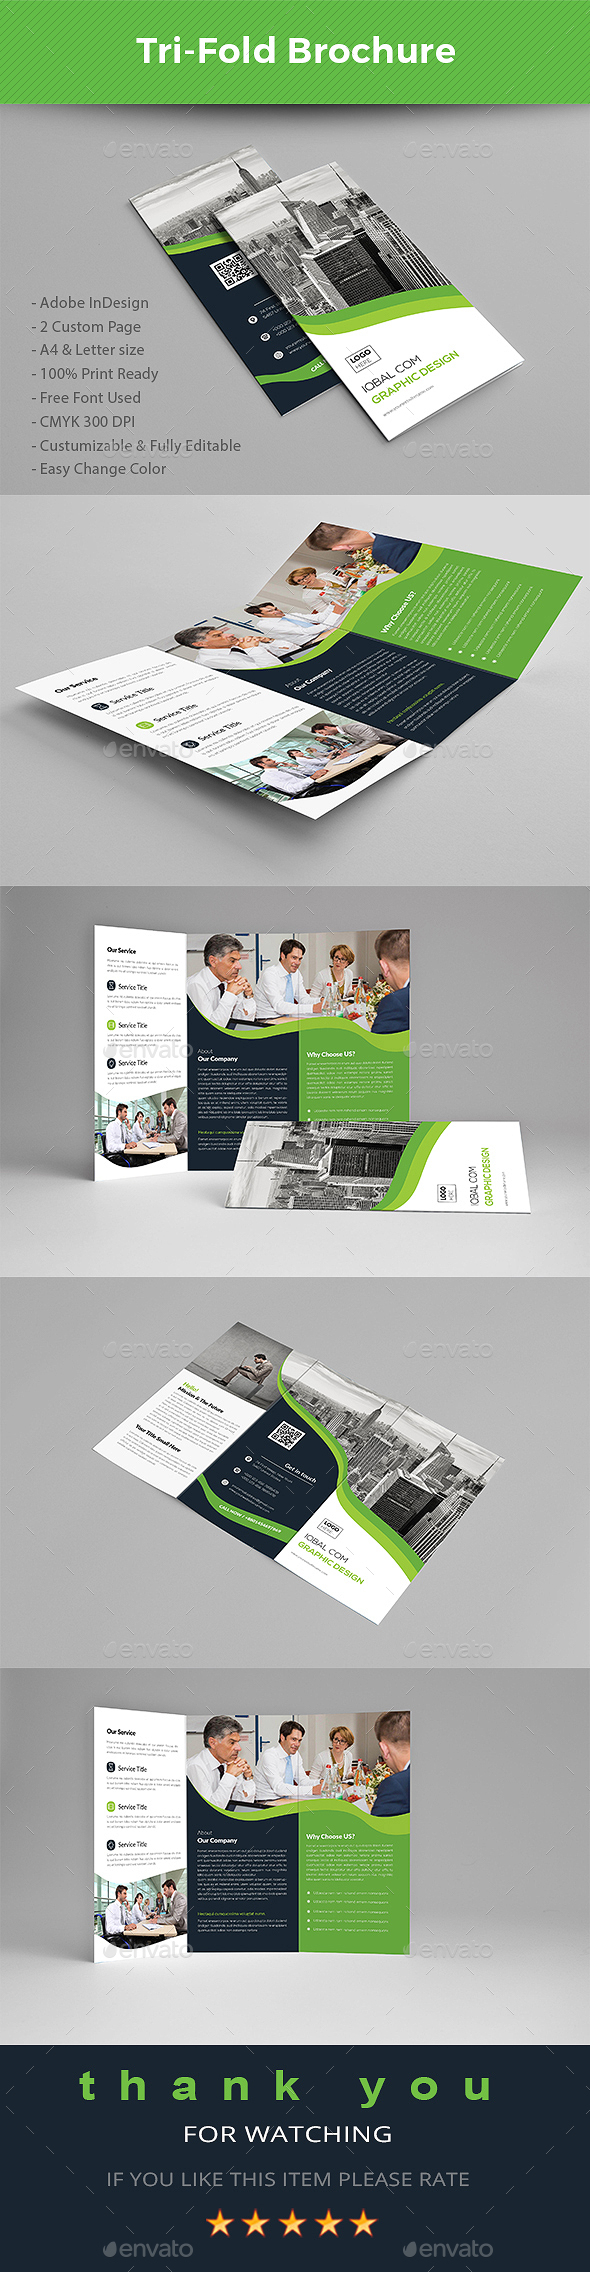 Letter Size Tri Fold Brochure Template - Tri Fold Brochure